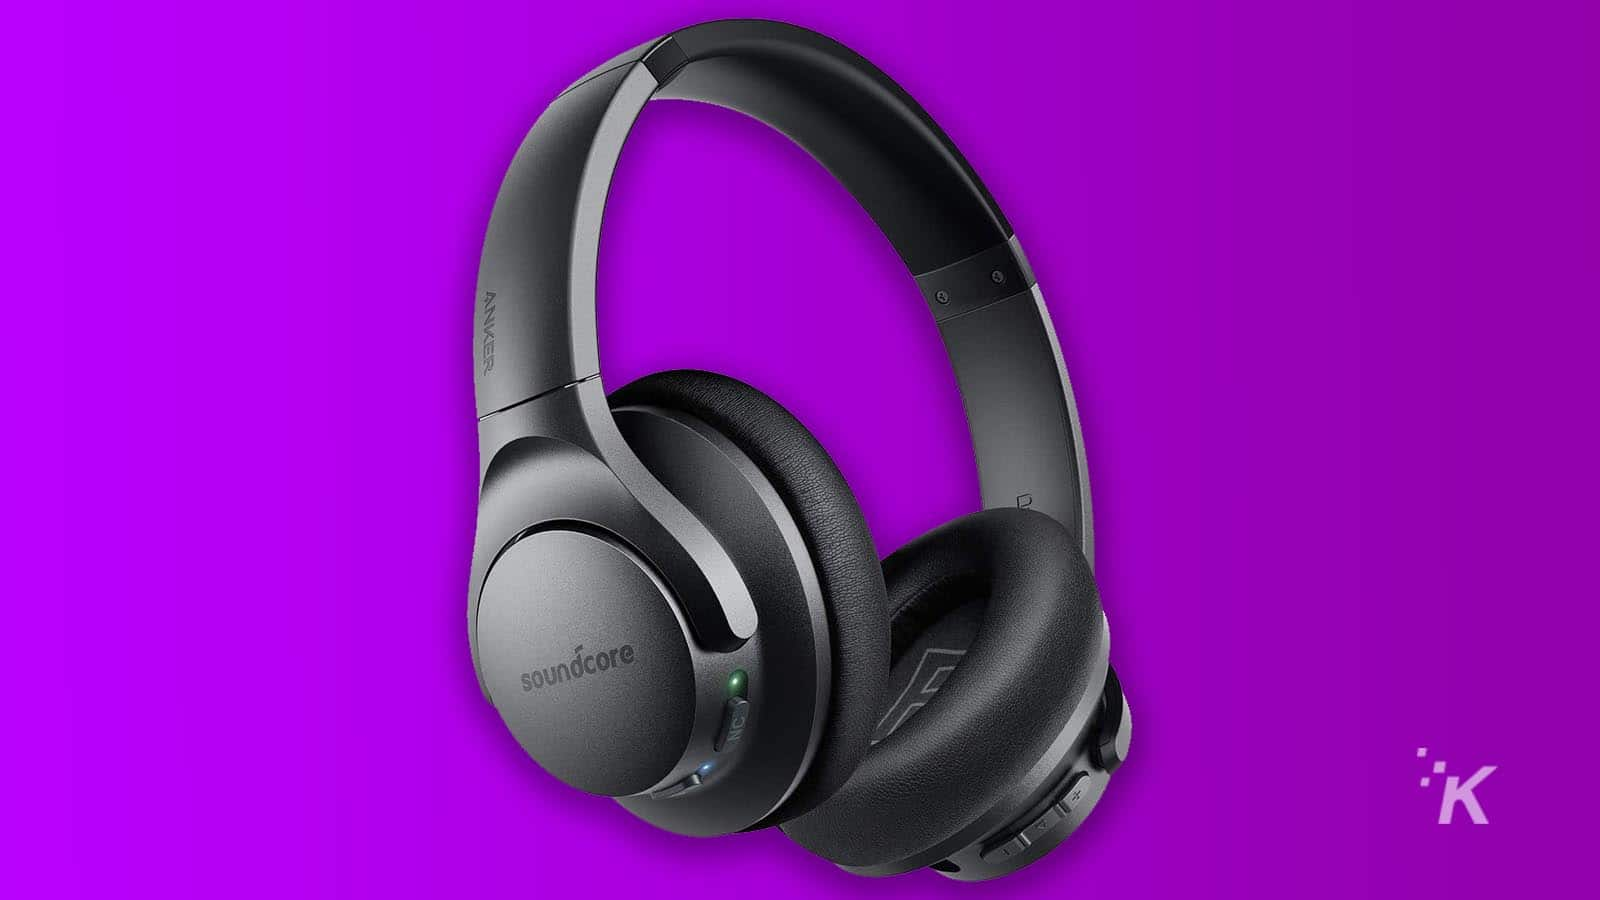 anker soundcore headphones